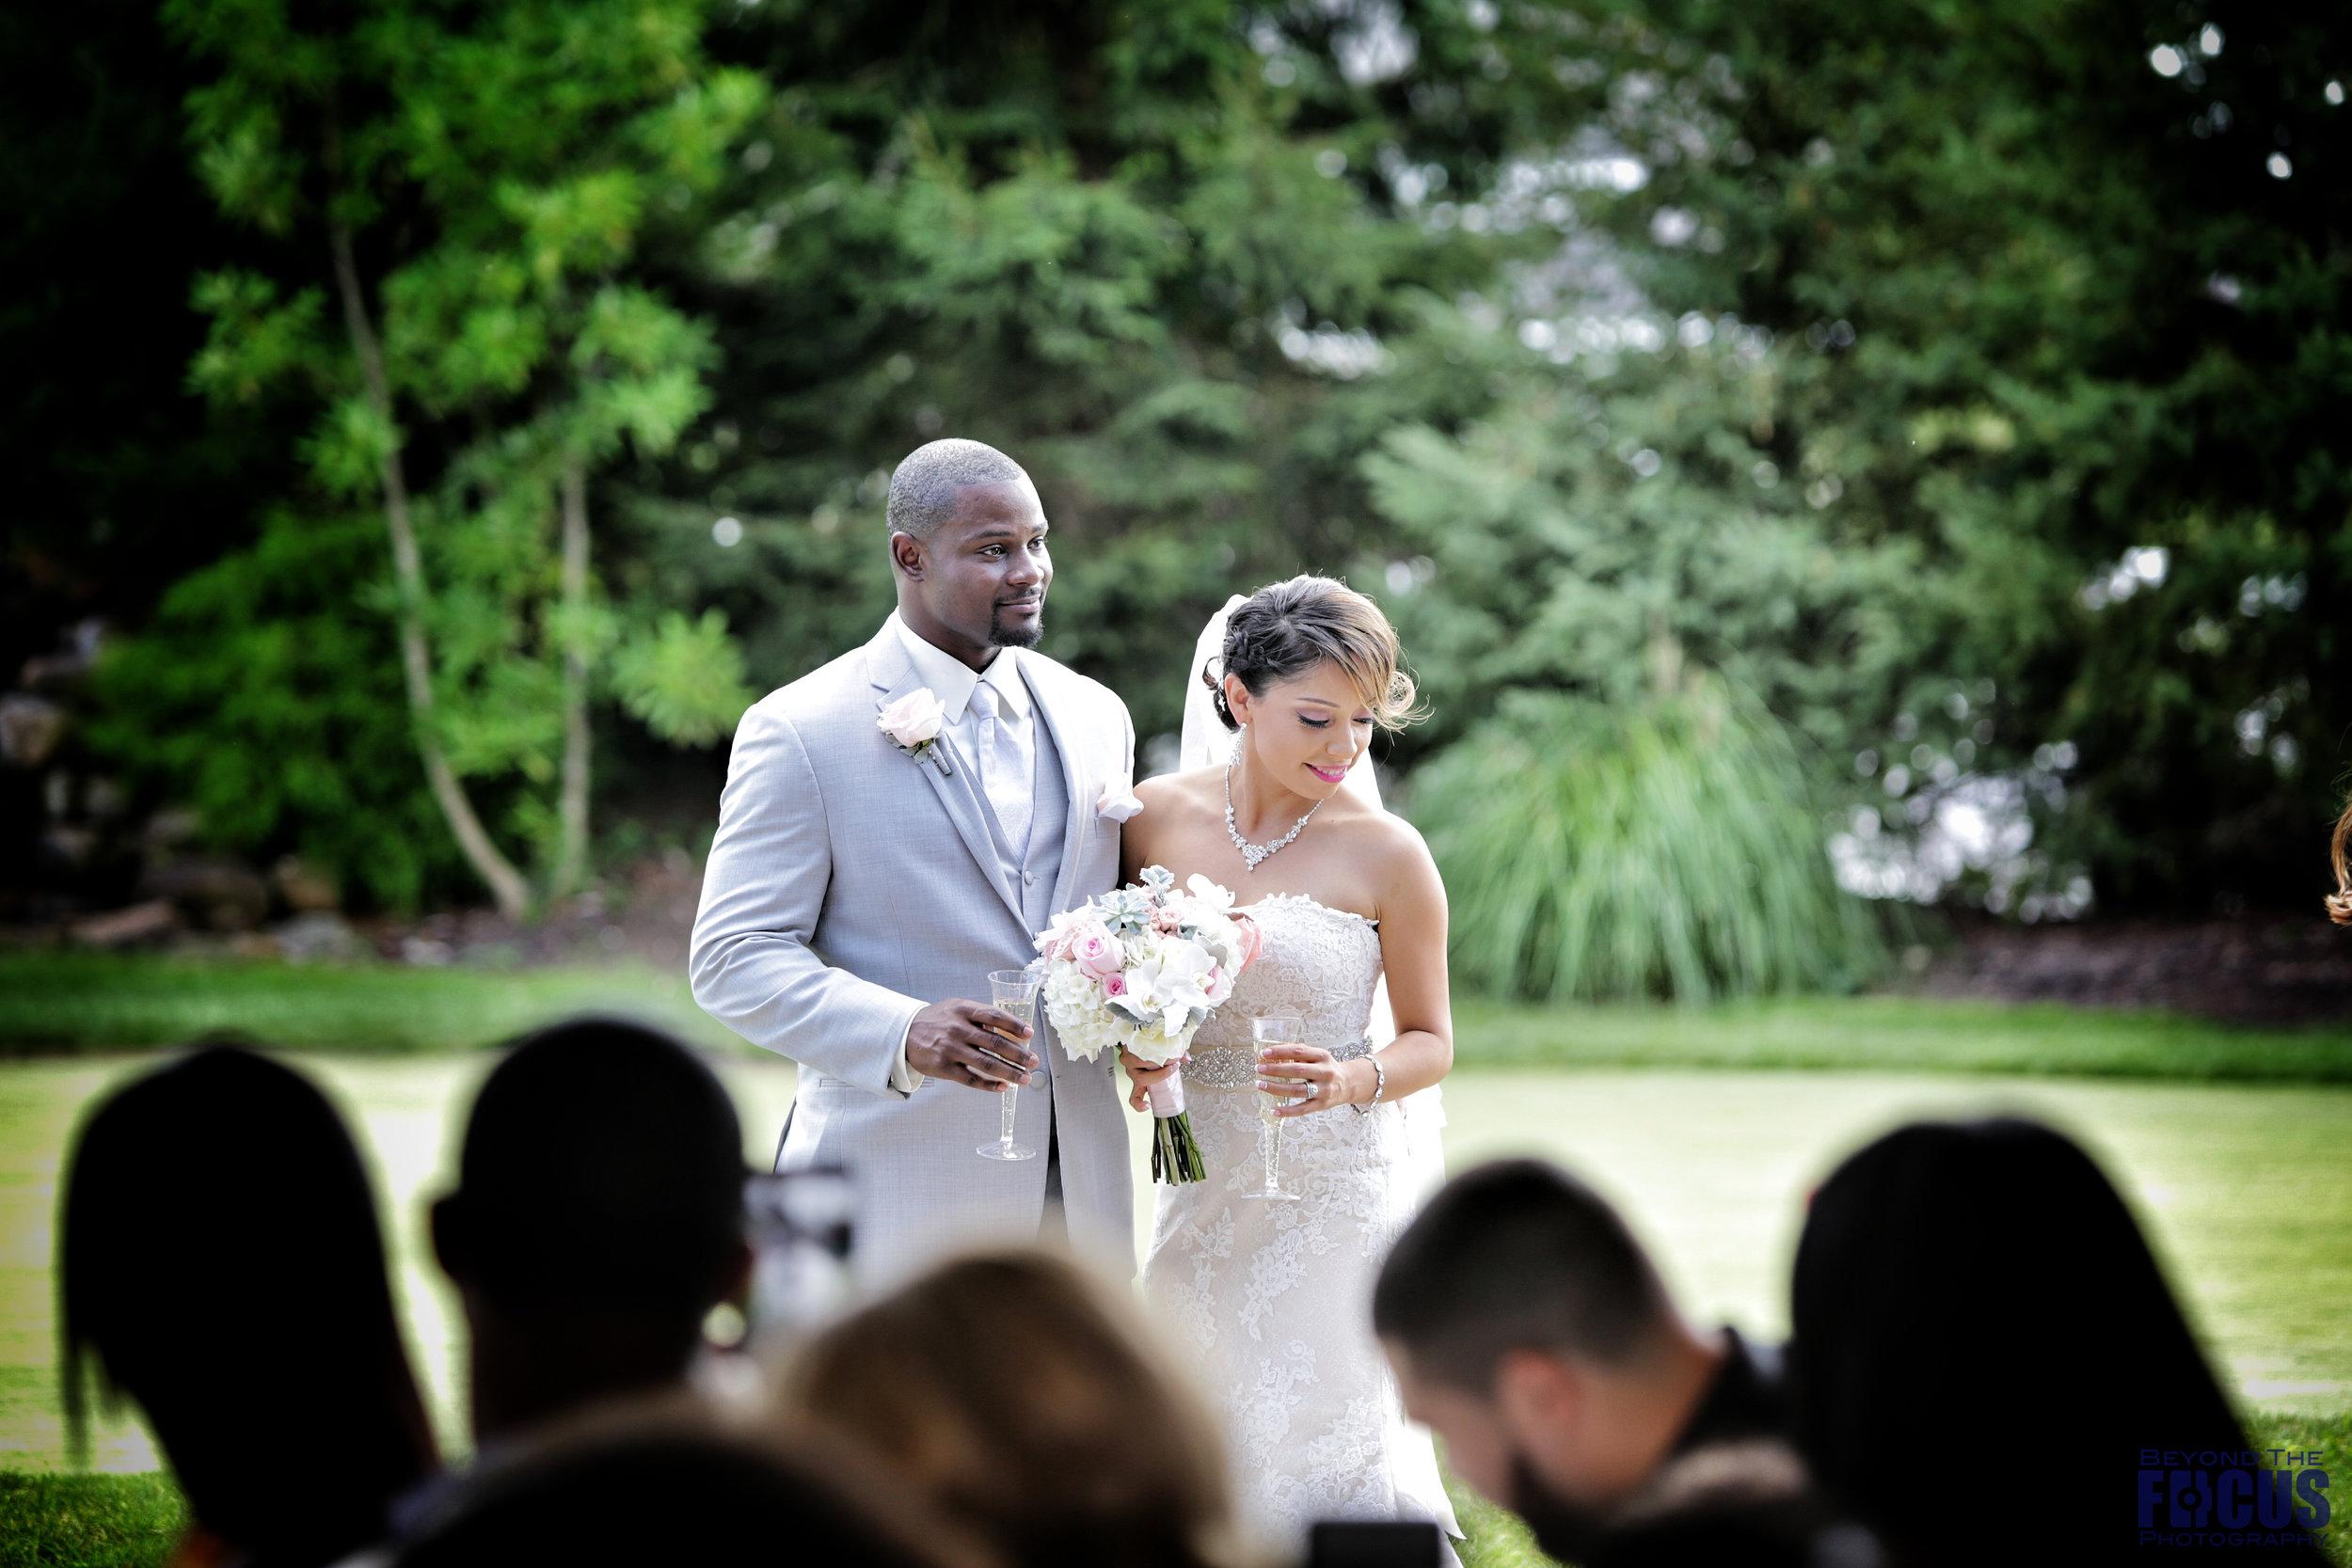 Palmer Wedding - Wedding Ceremony58.jpg